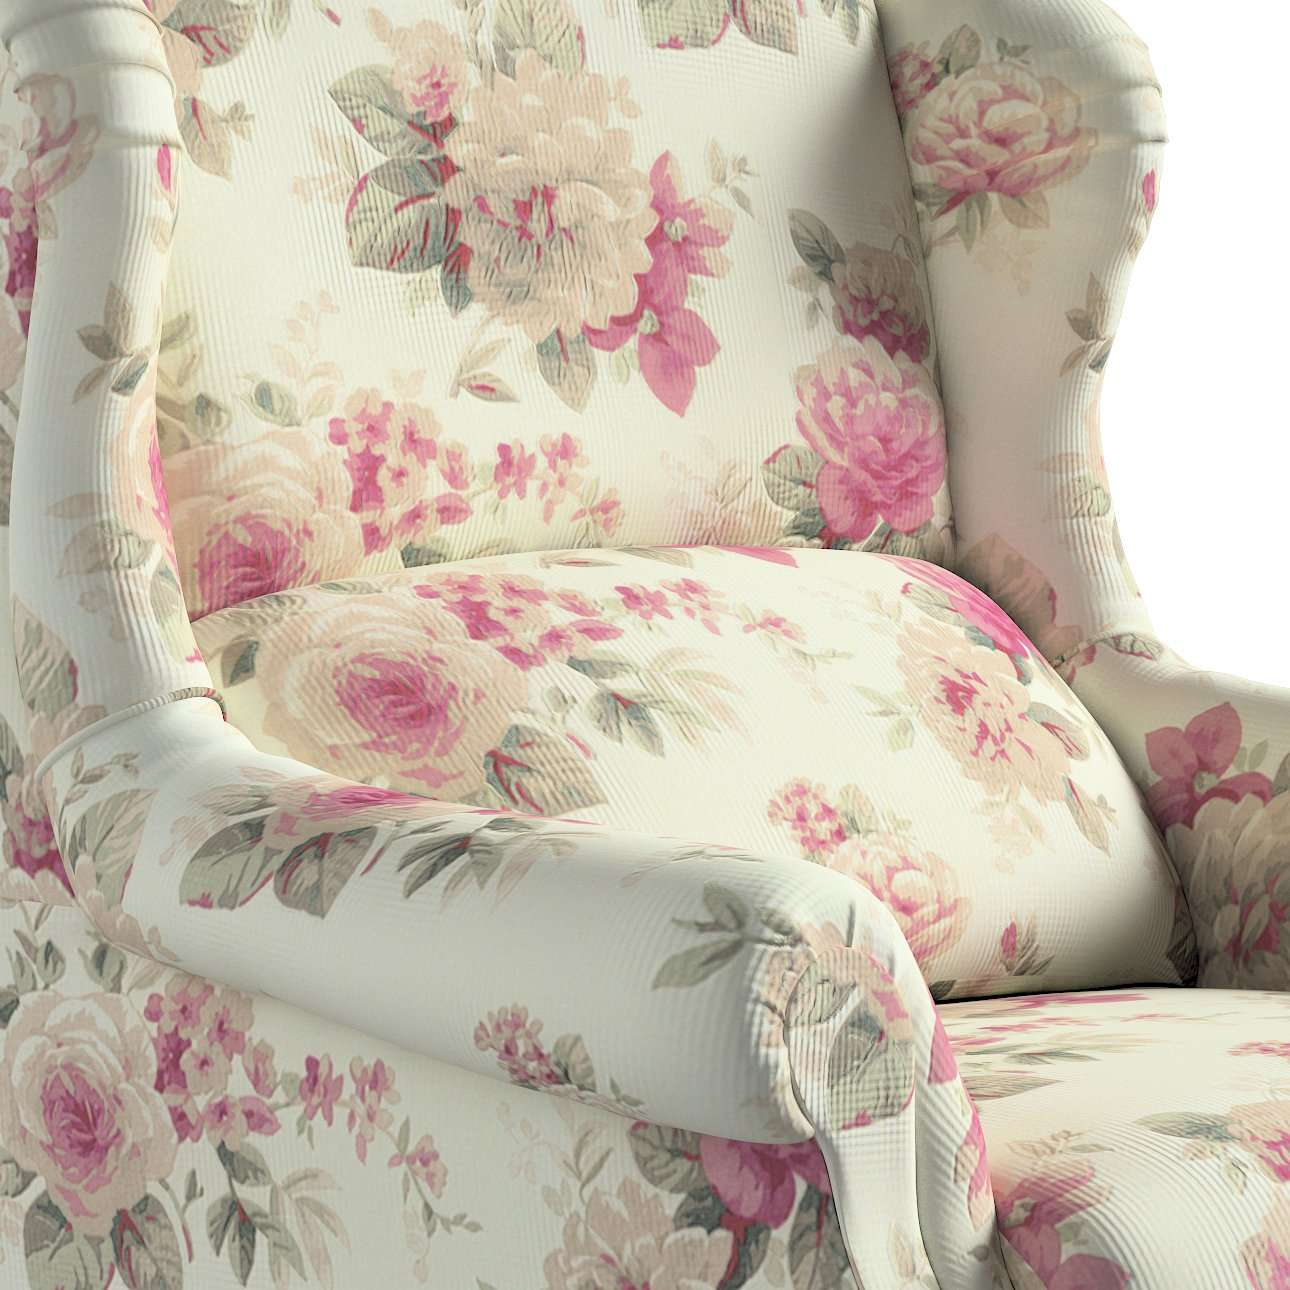 Fotel Unique w kolekcji Londres, tkanina: 141-07